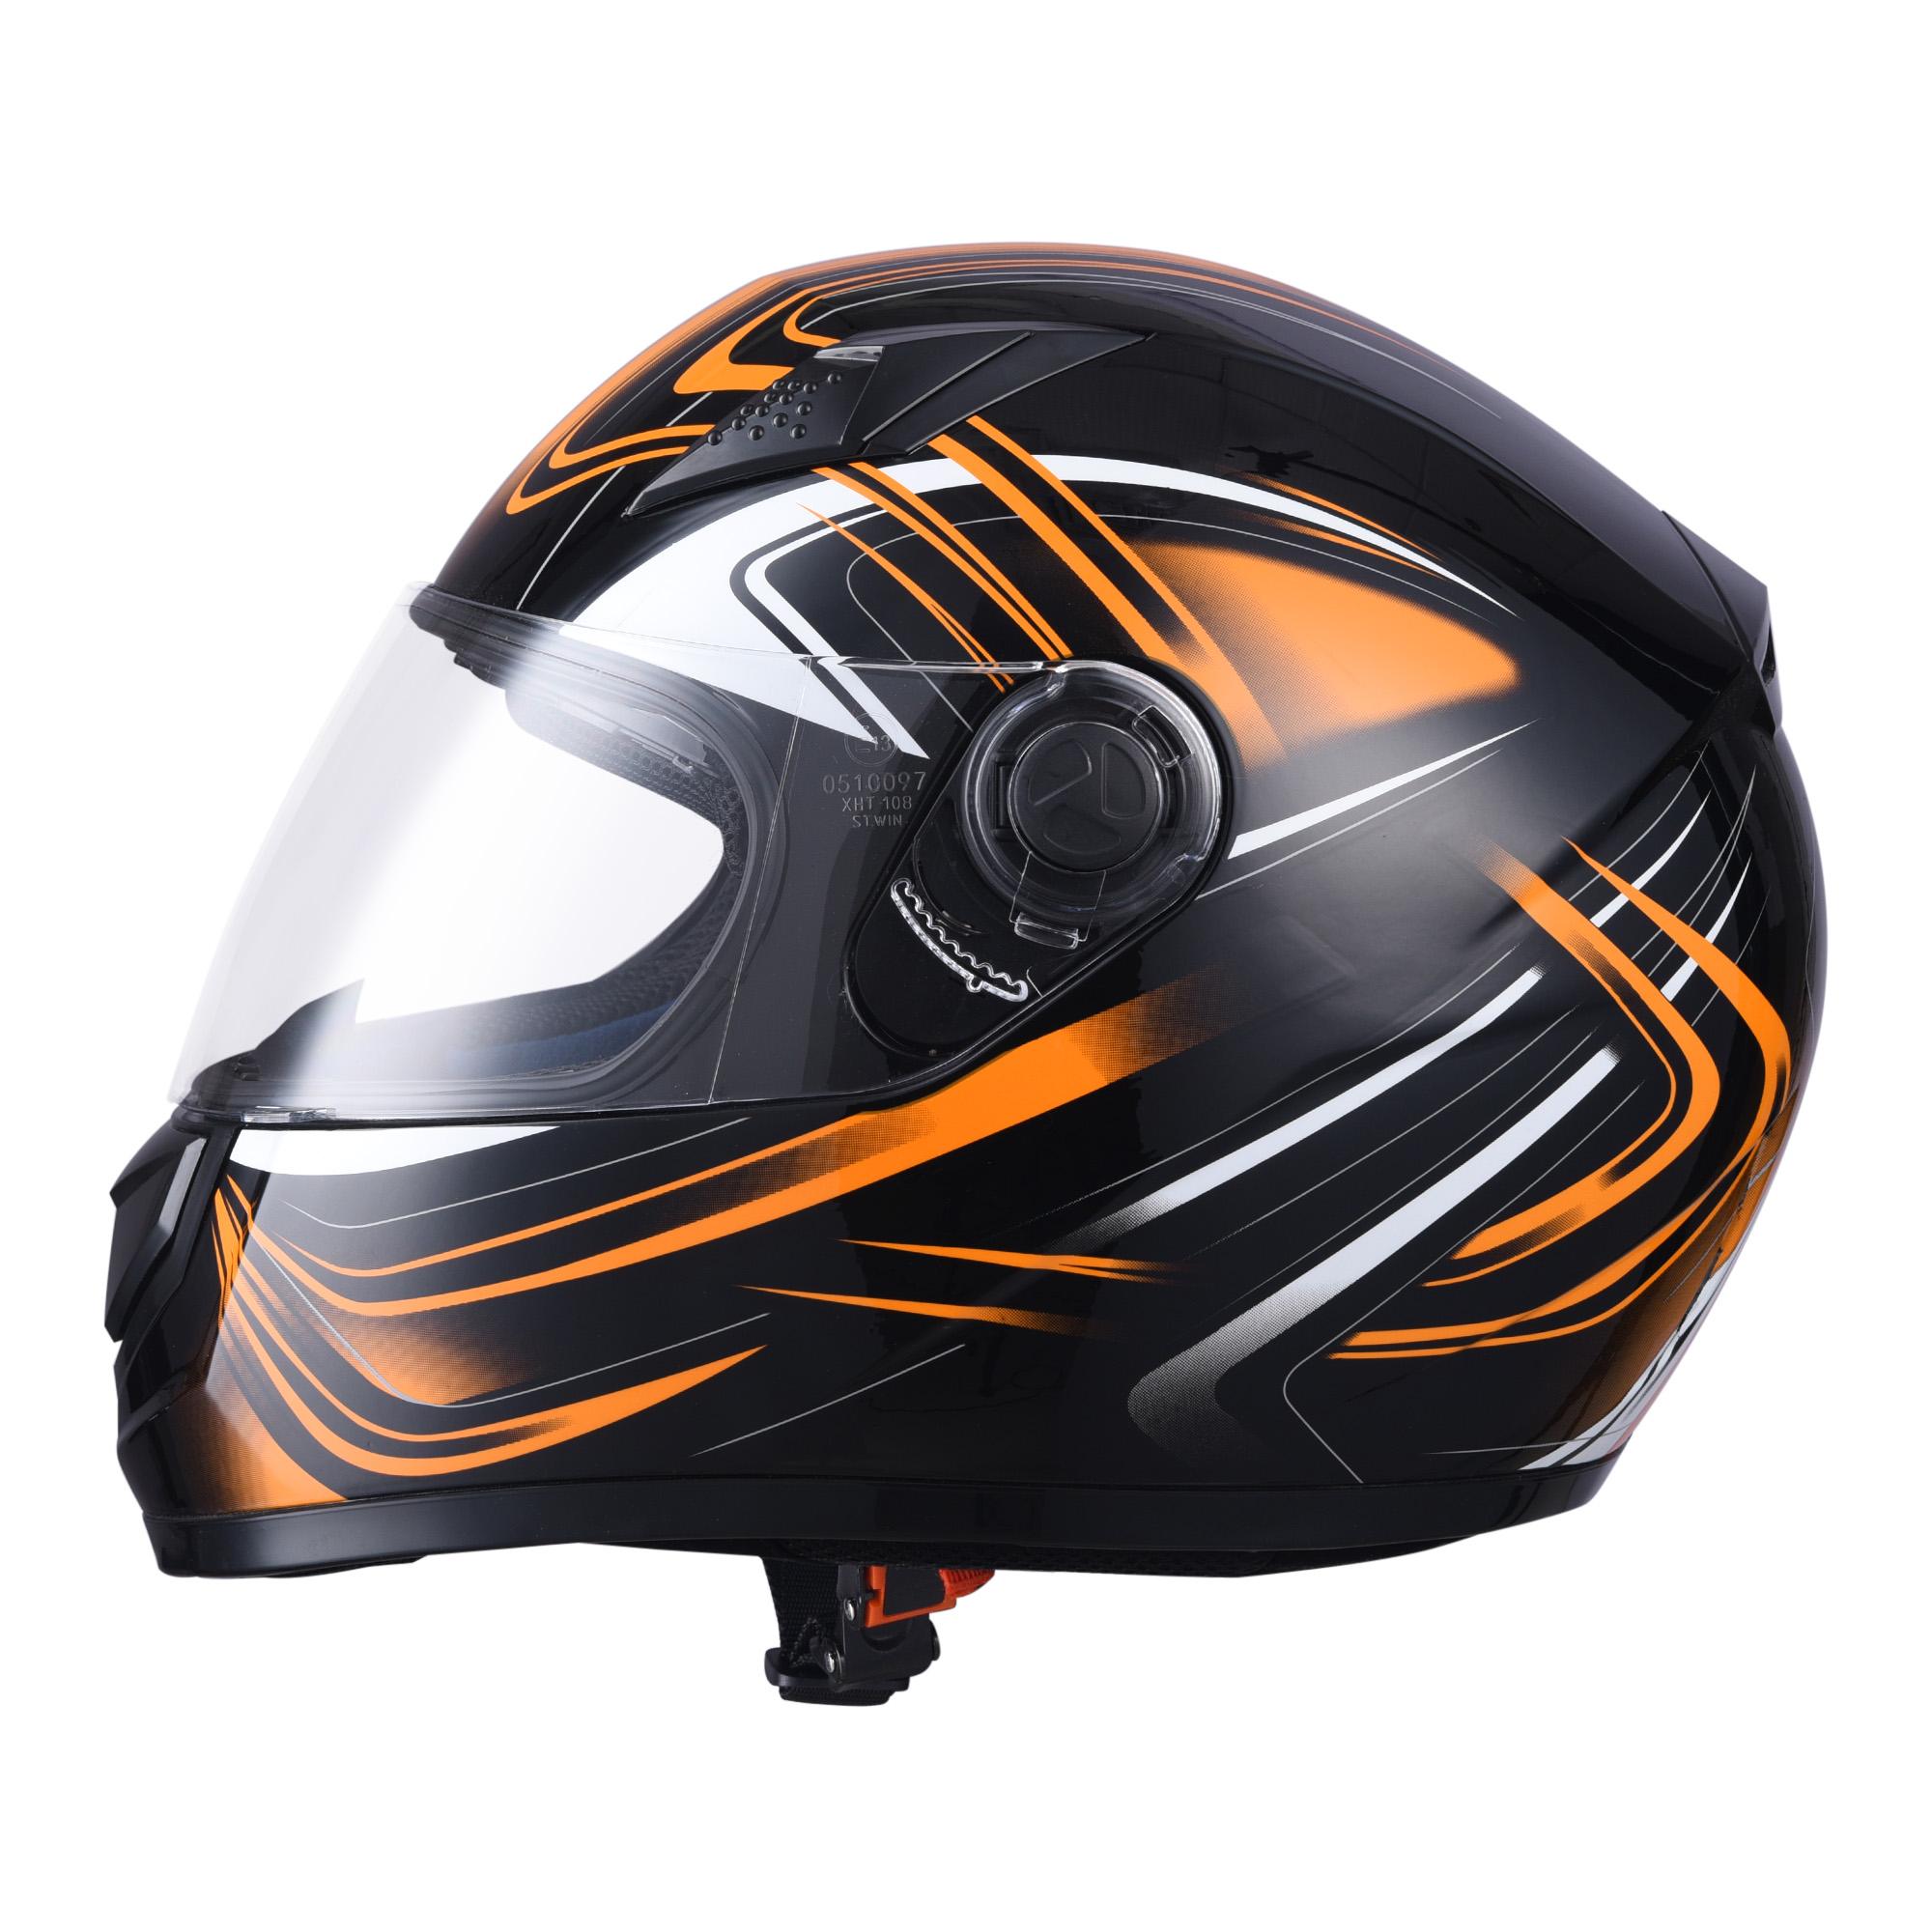 miniature 75 - AHR K12 Full Face Motorcycle Helmet DOT Air Vents Clear Visor Racing S M L XL